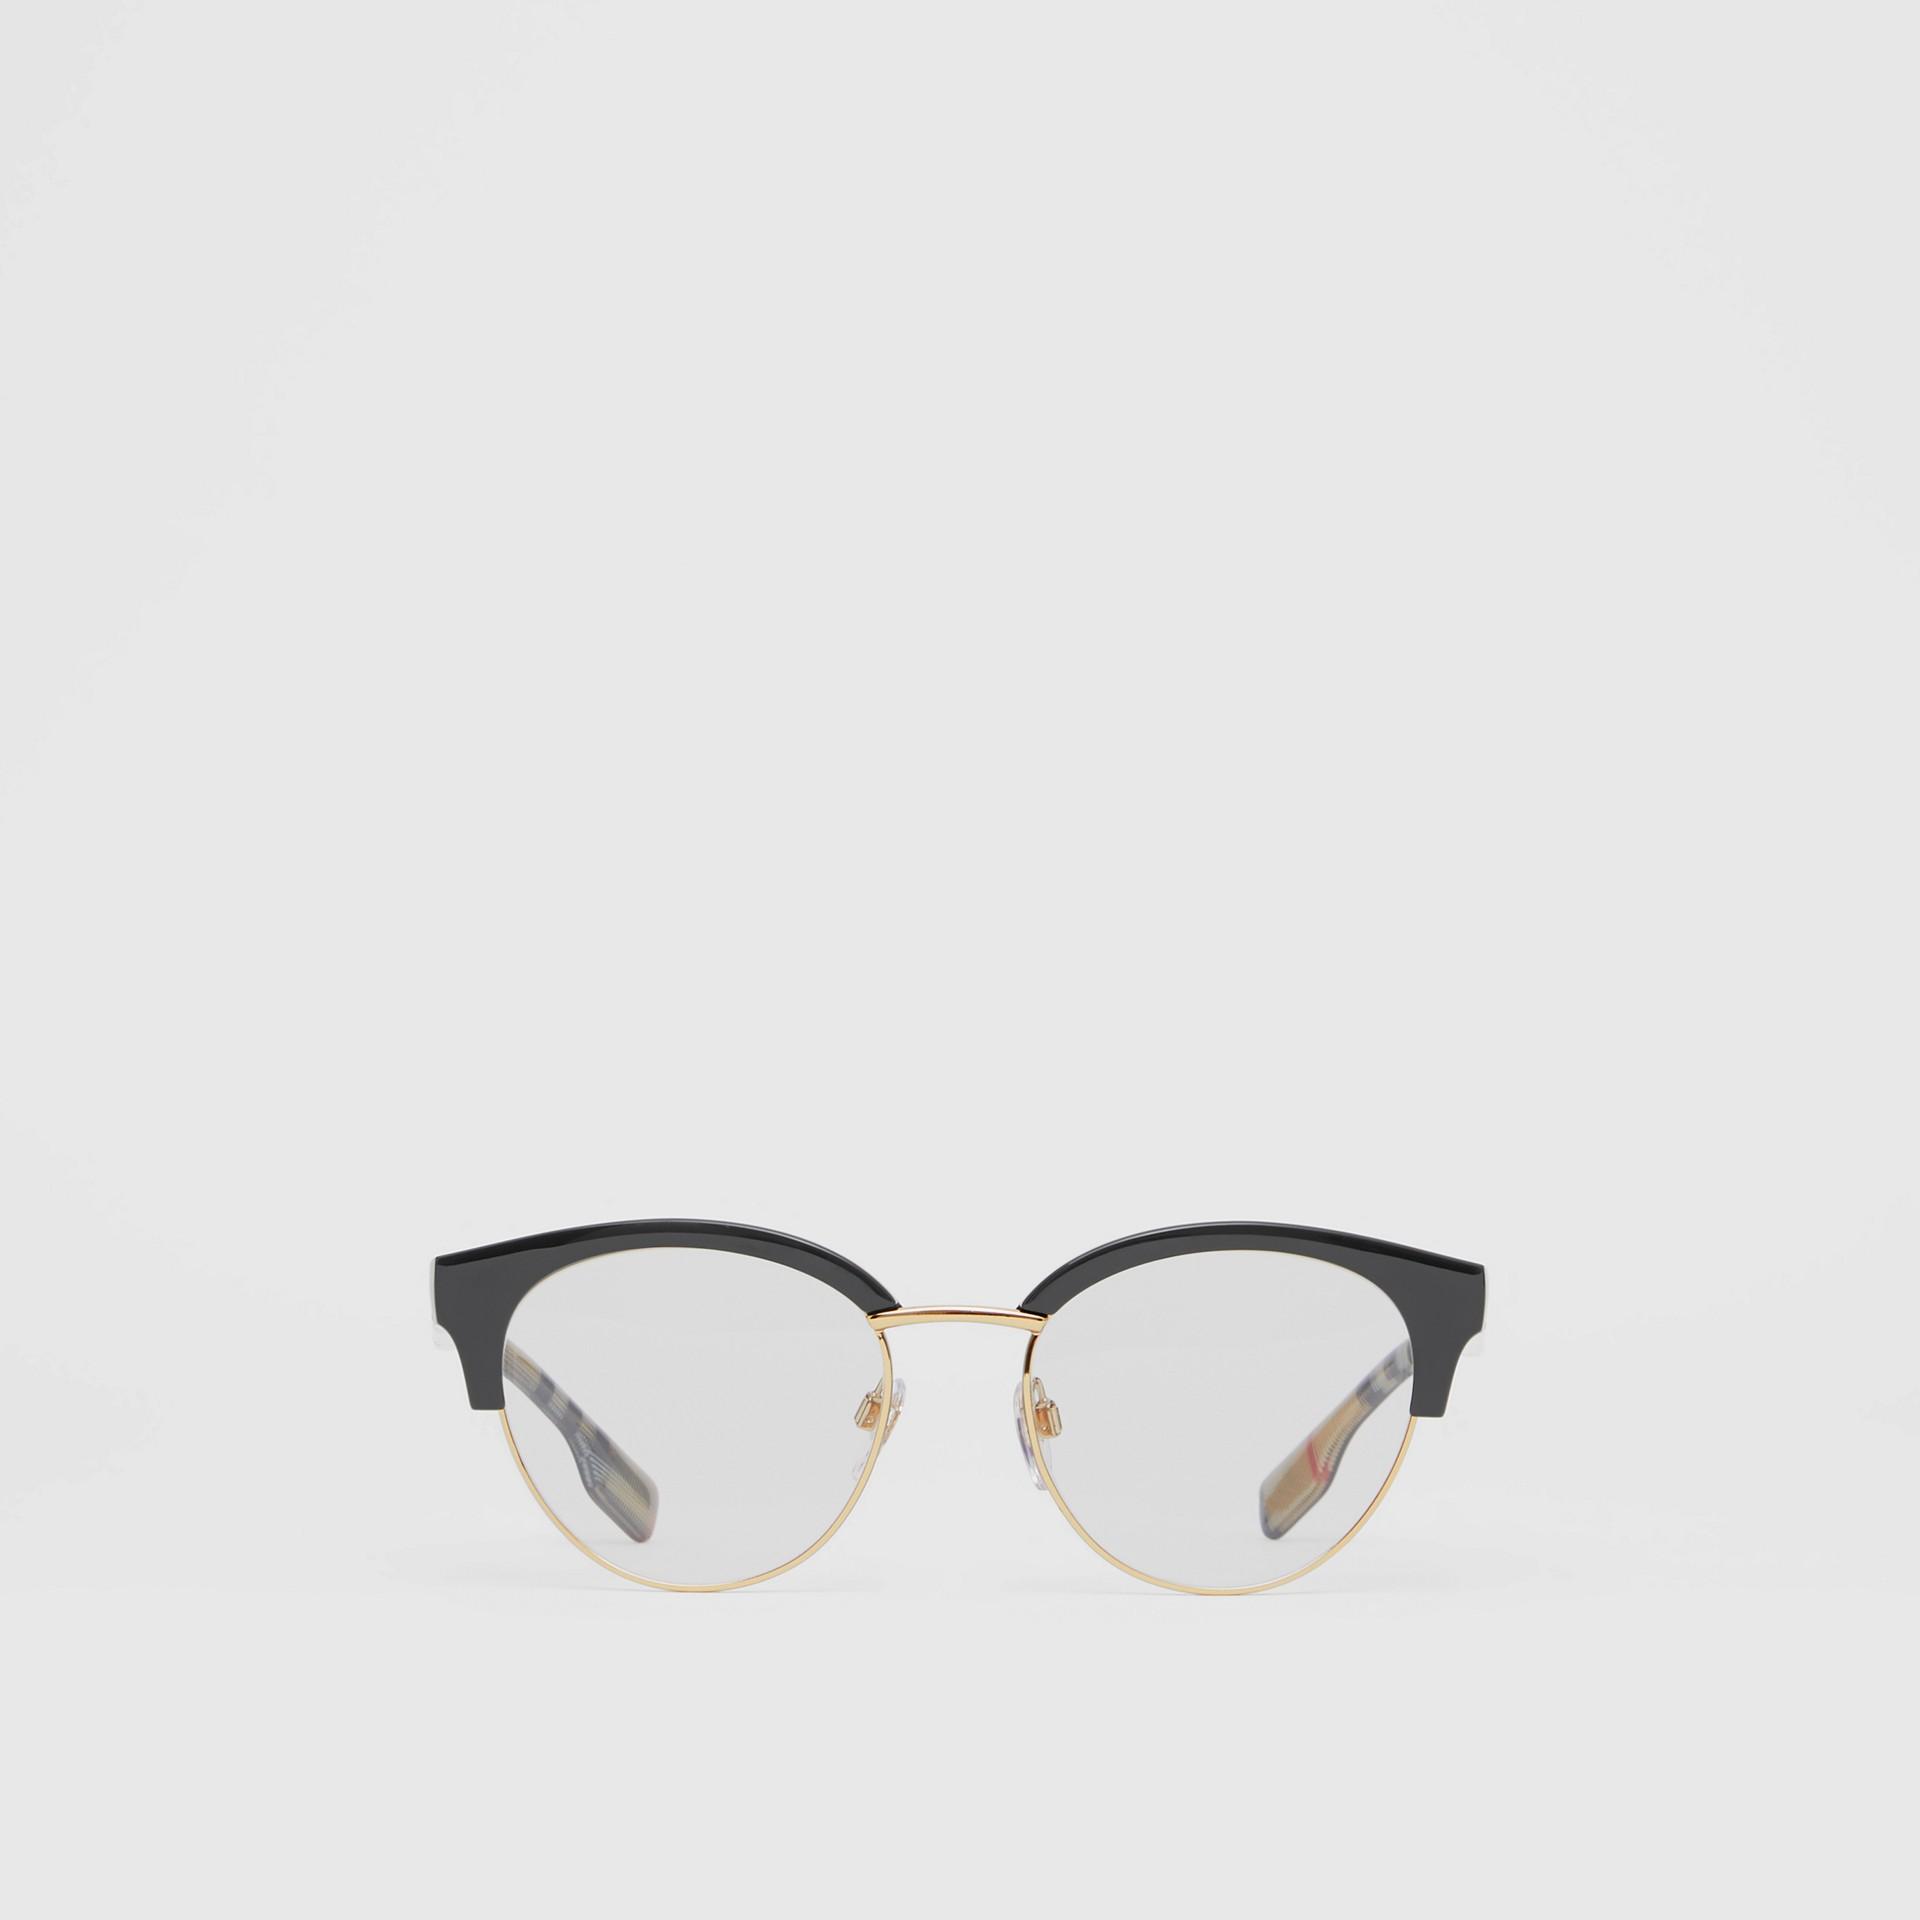 Cat-eye Optical Frames in Black/beige - Women | Burberry Australia - gallery image 0